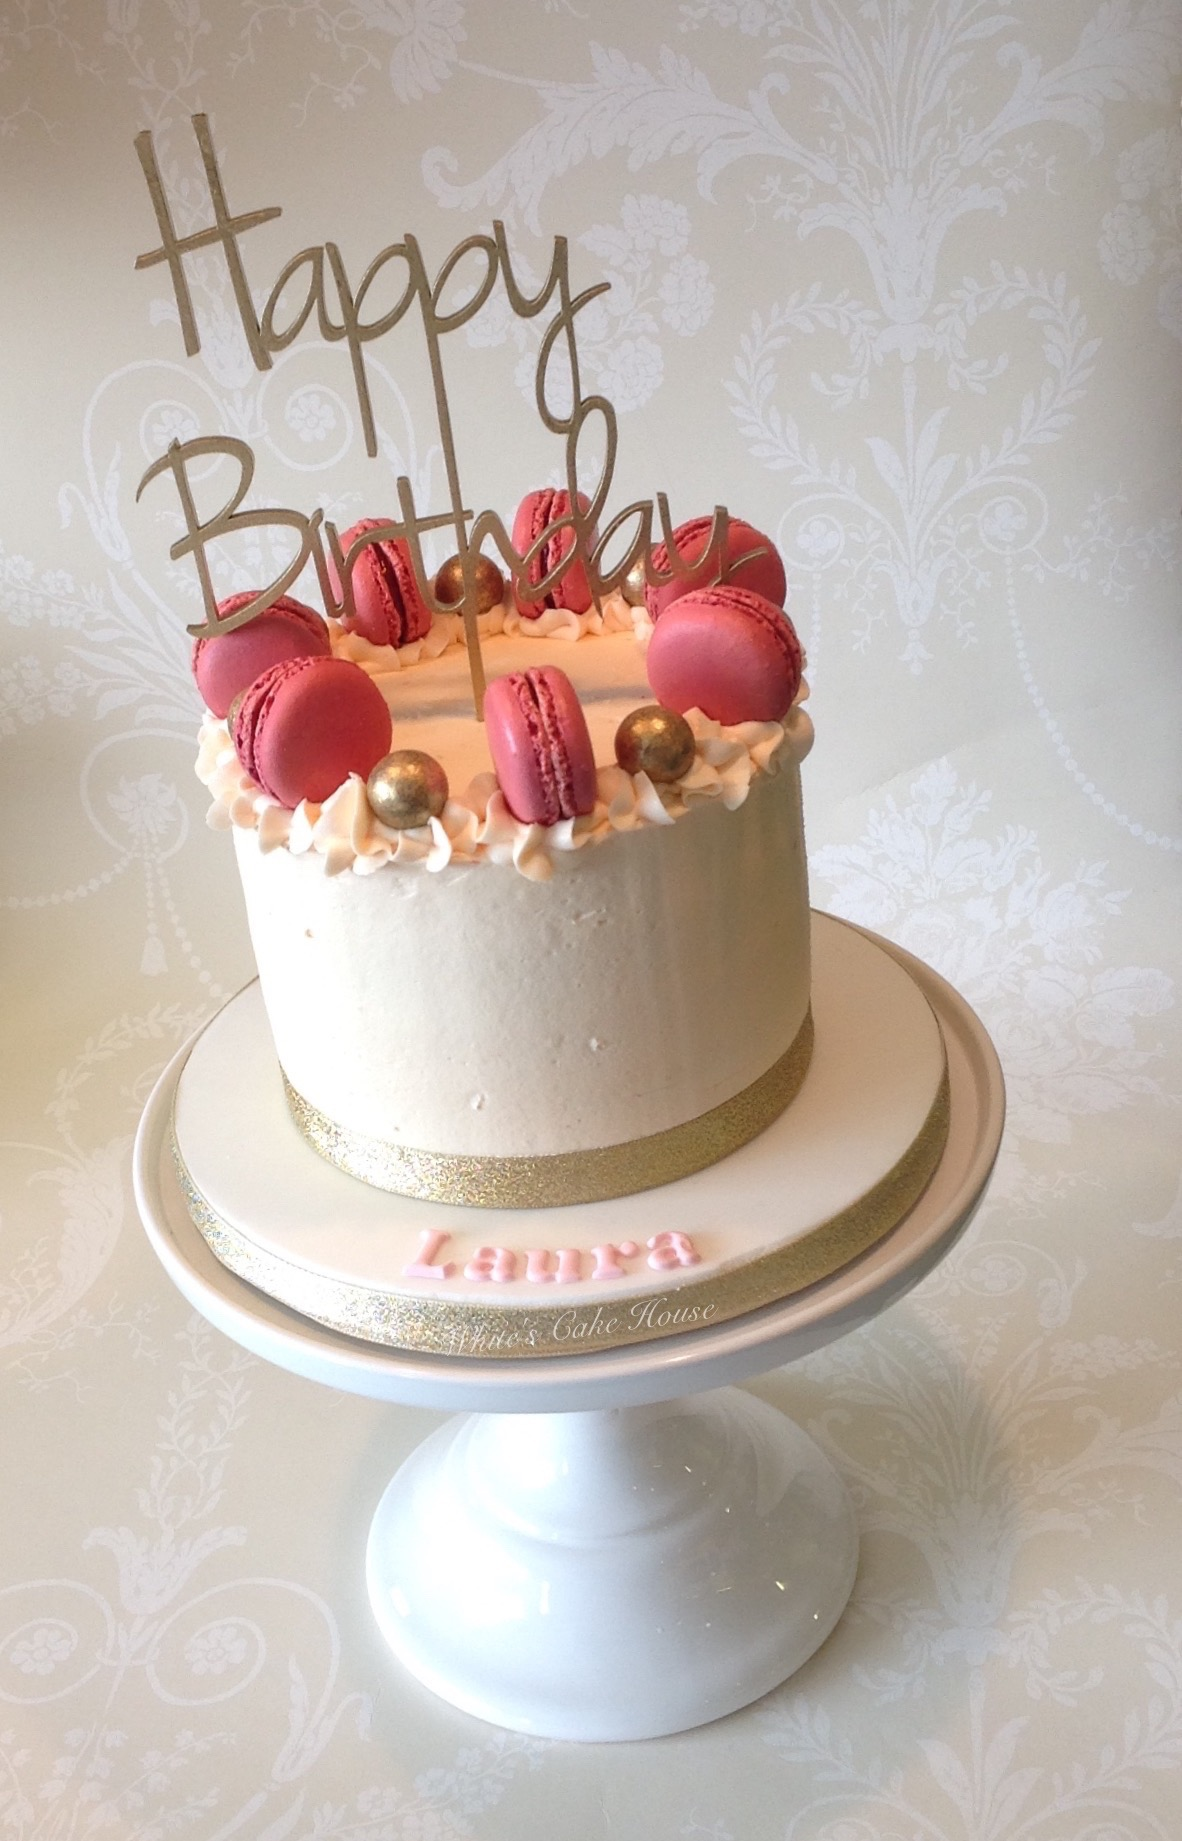 Birthdays Girls White S Cake House